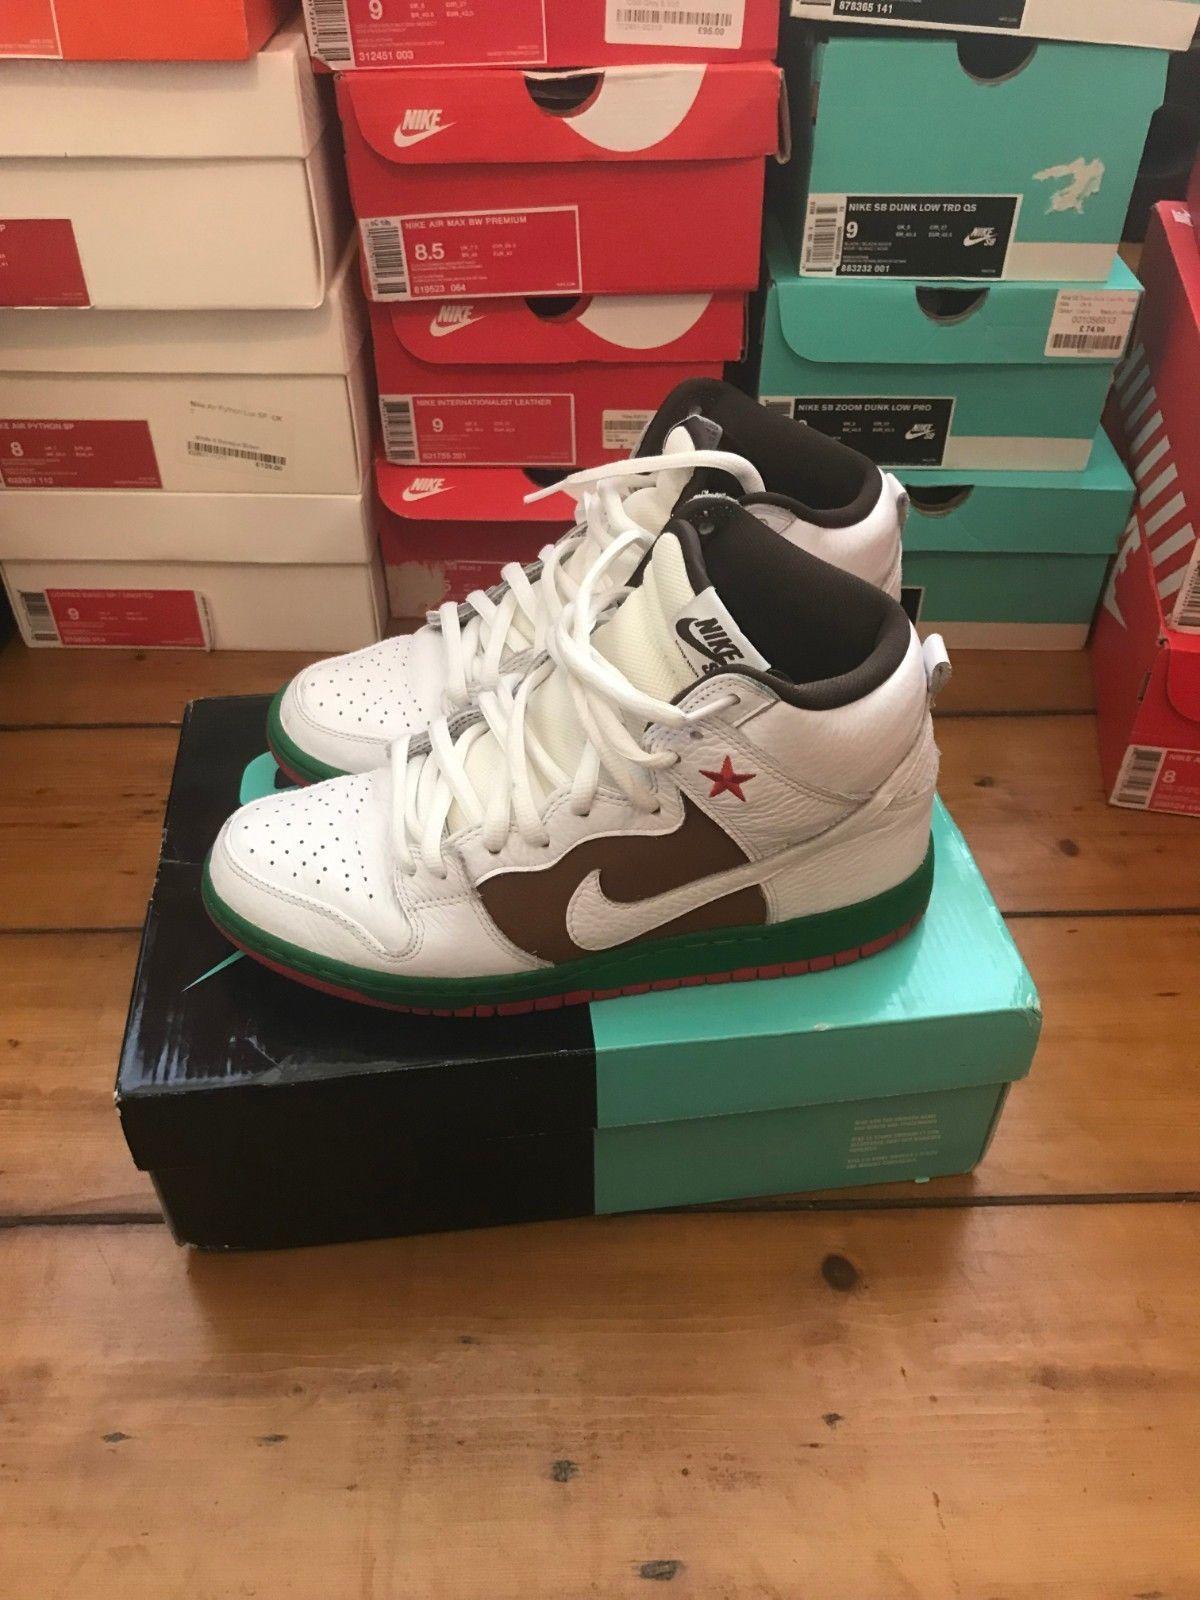 finest selection 1f3cd 81814 Nike SB Dunk High  31st State - Cali   California Size 8 UK 42.5